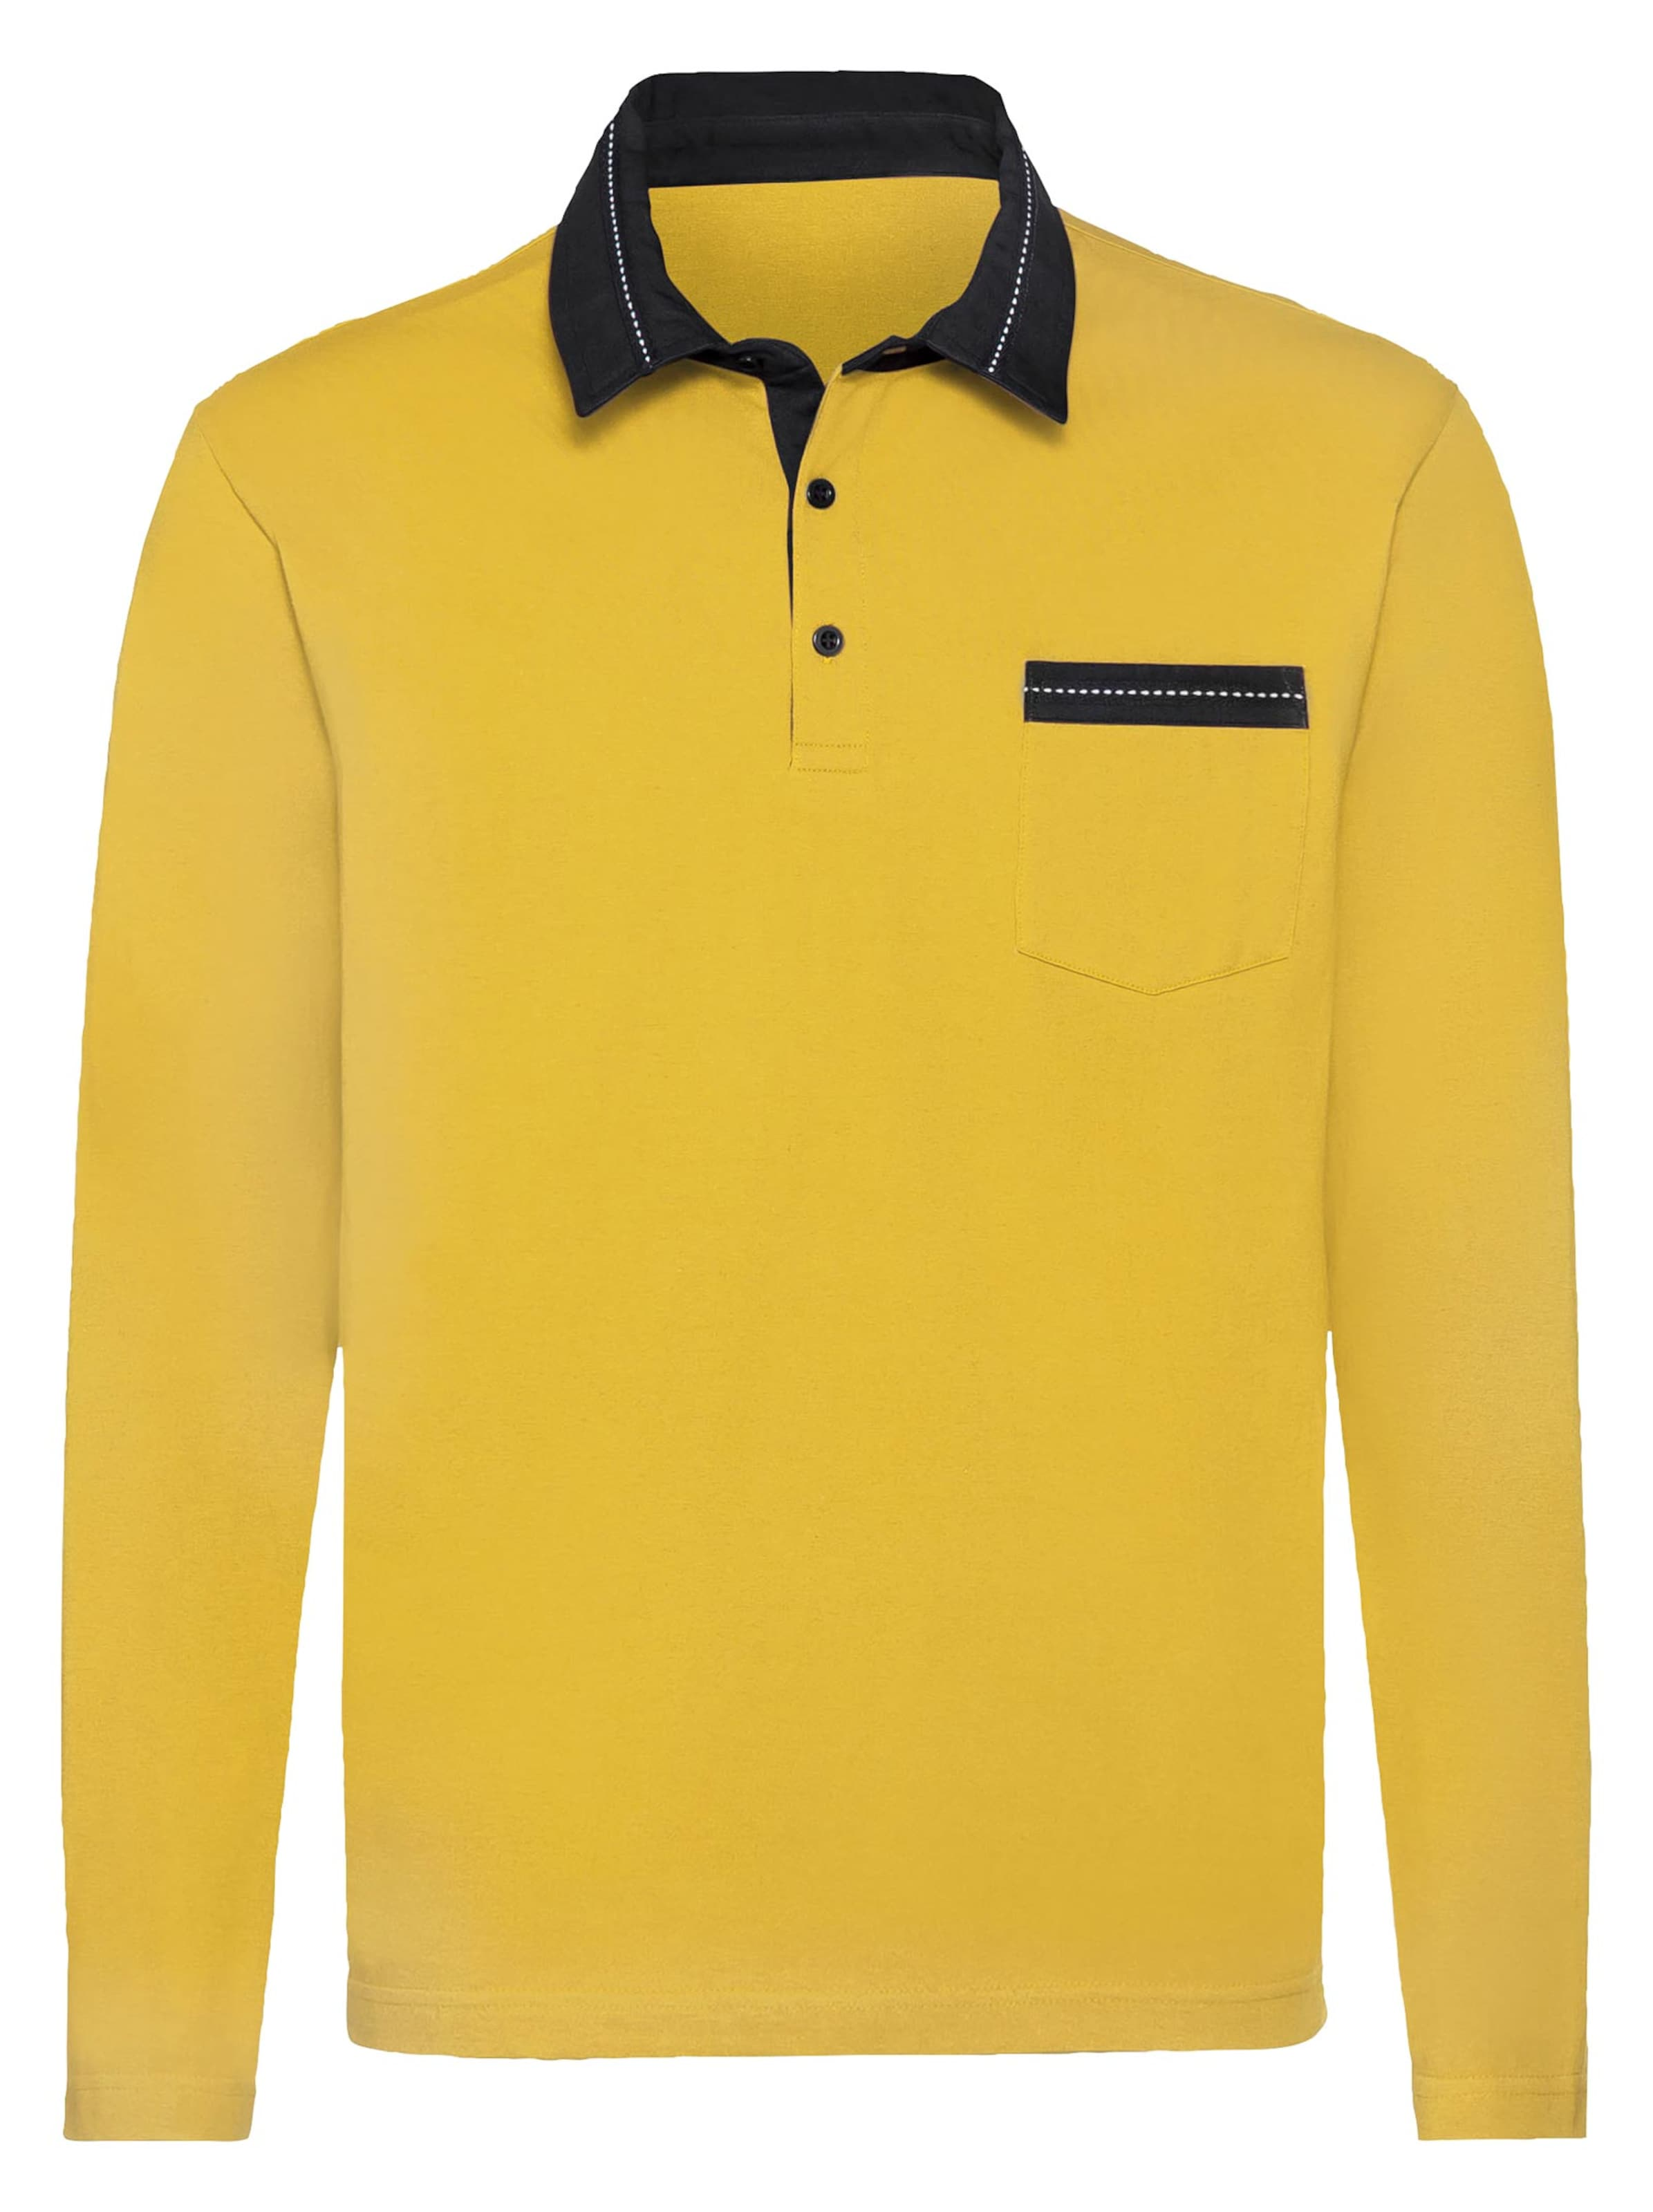 catamaran - Witt Weiden Herren Langarm-Shirt gelb